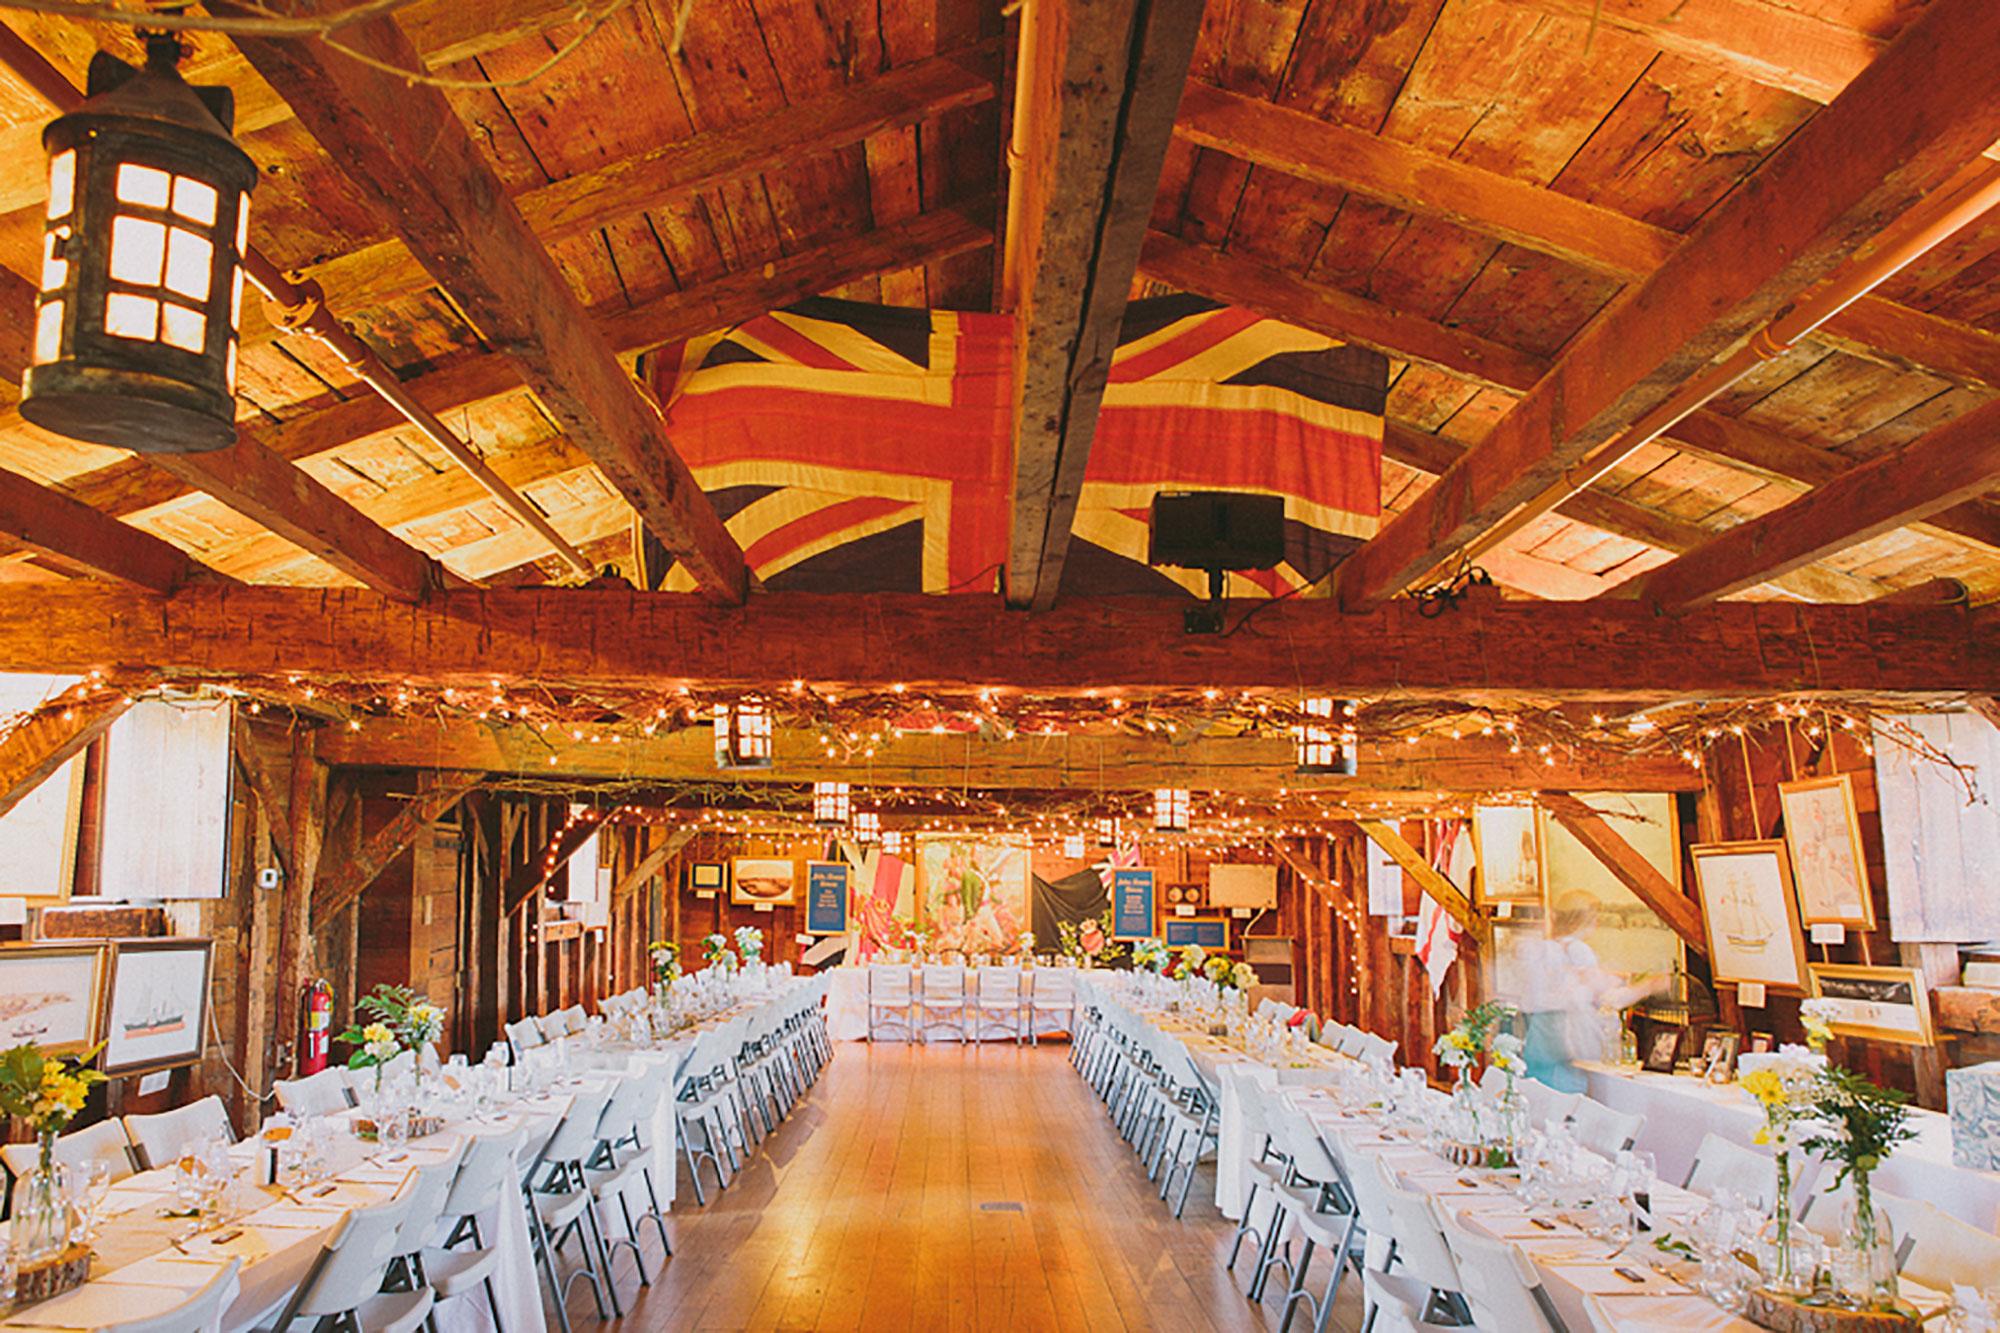 Navy-Hall-Wedding-Vineyard-Bride-Photo-By-Andrew-Mark-Photography-035.jpg